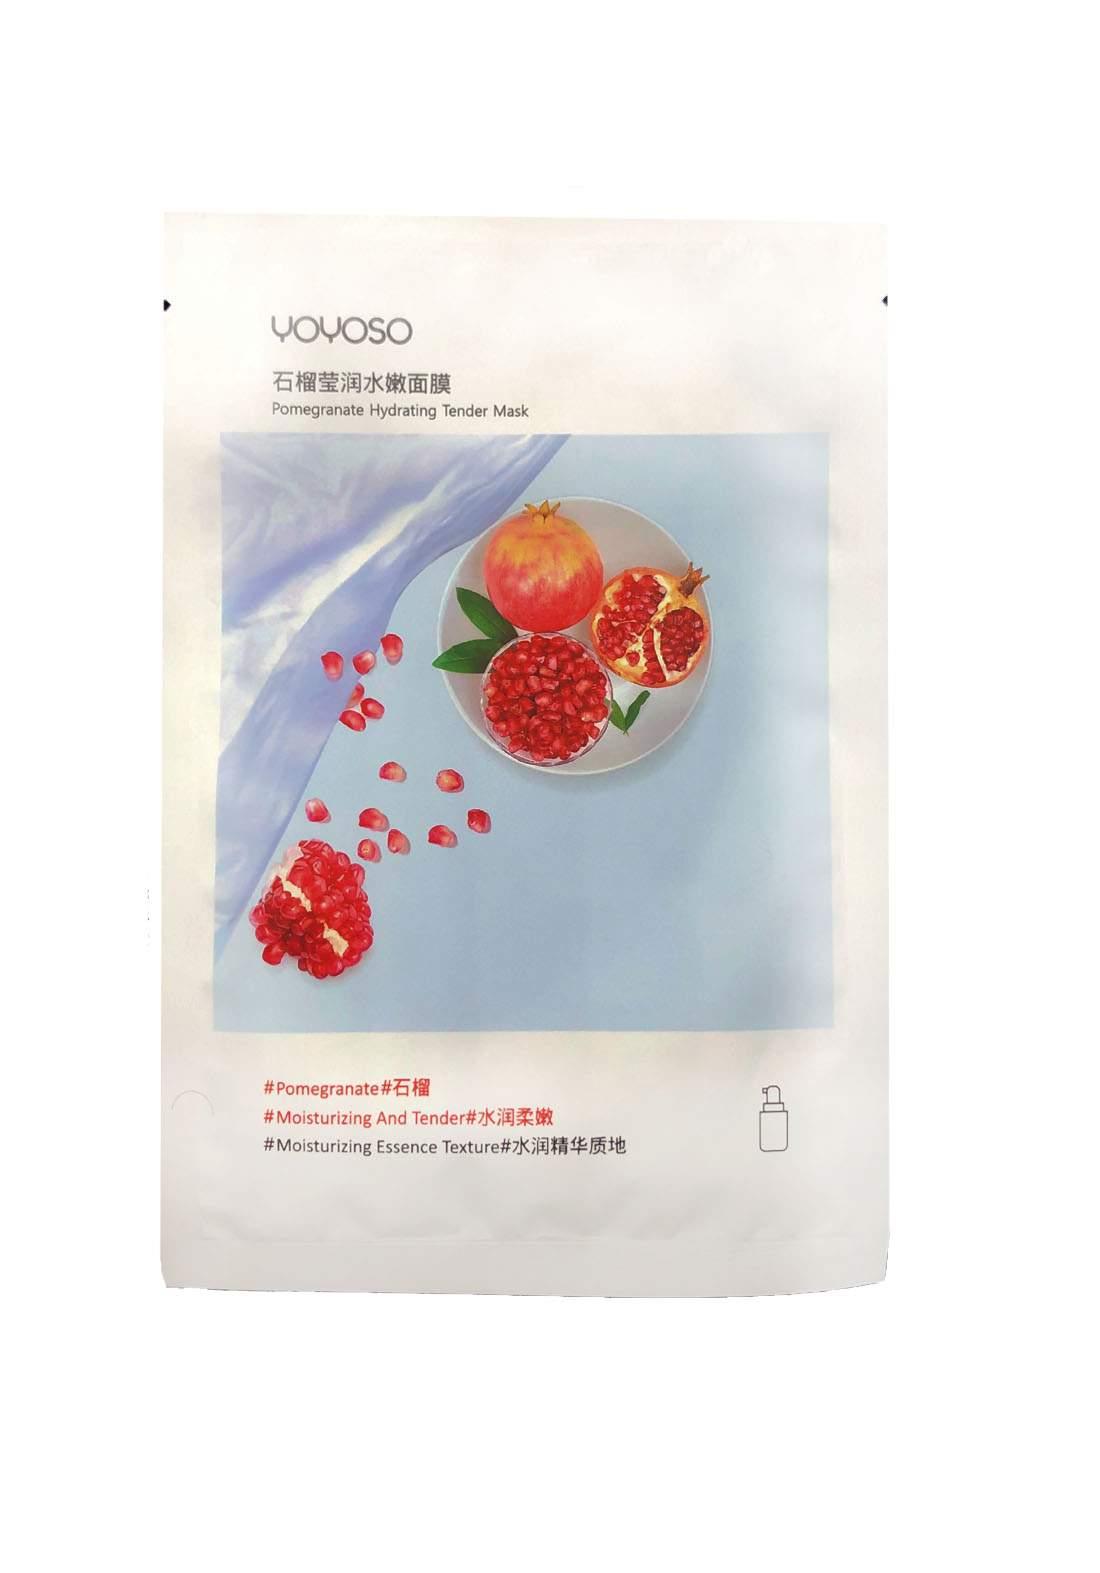 Yoyo So Pomegranate Hydrating Tender Mask ماسك للوجه